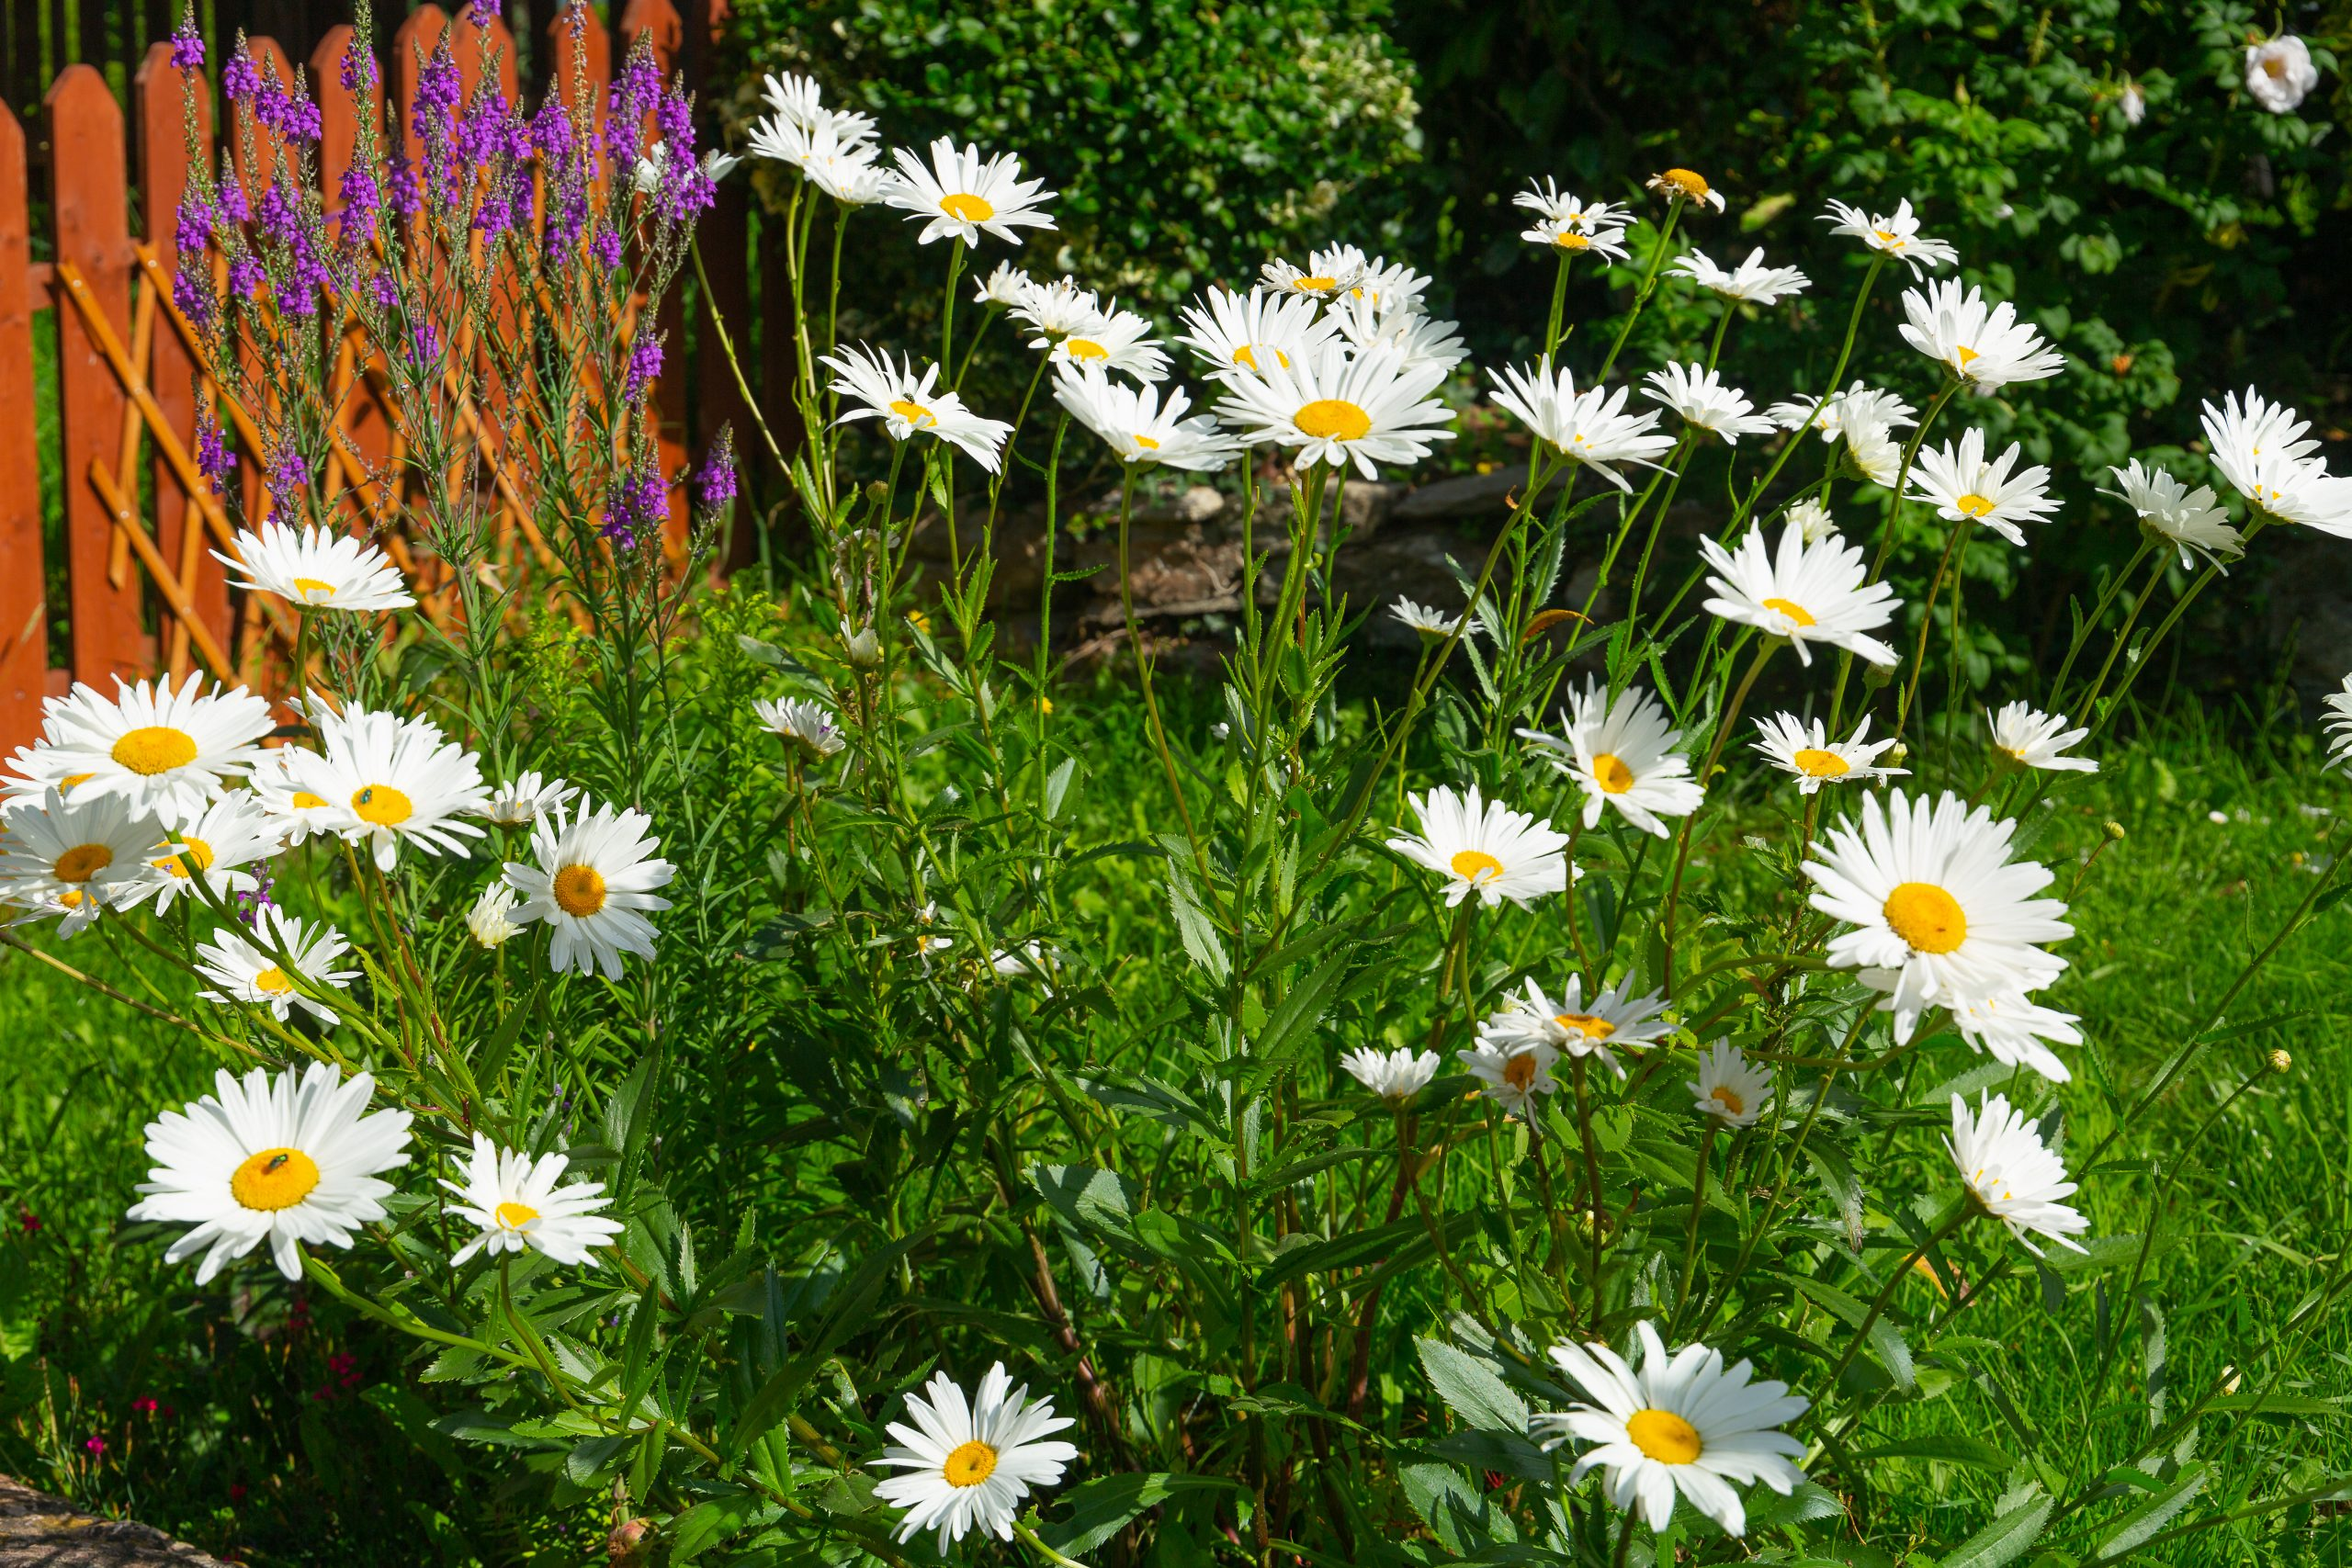 Shasta daisies in full bloom